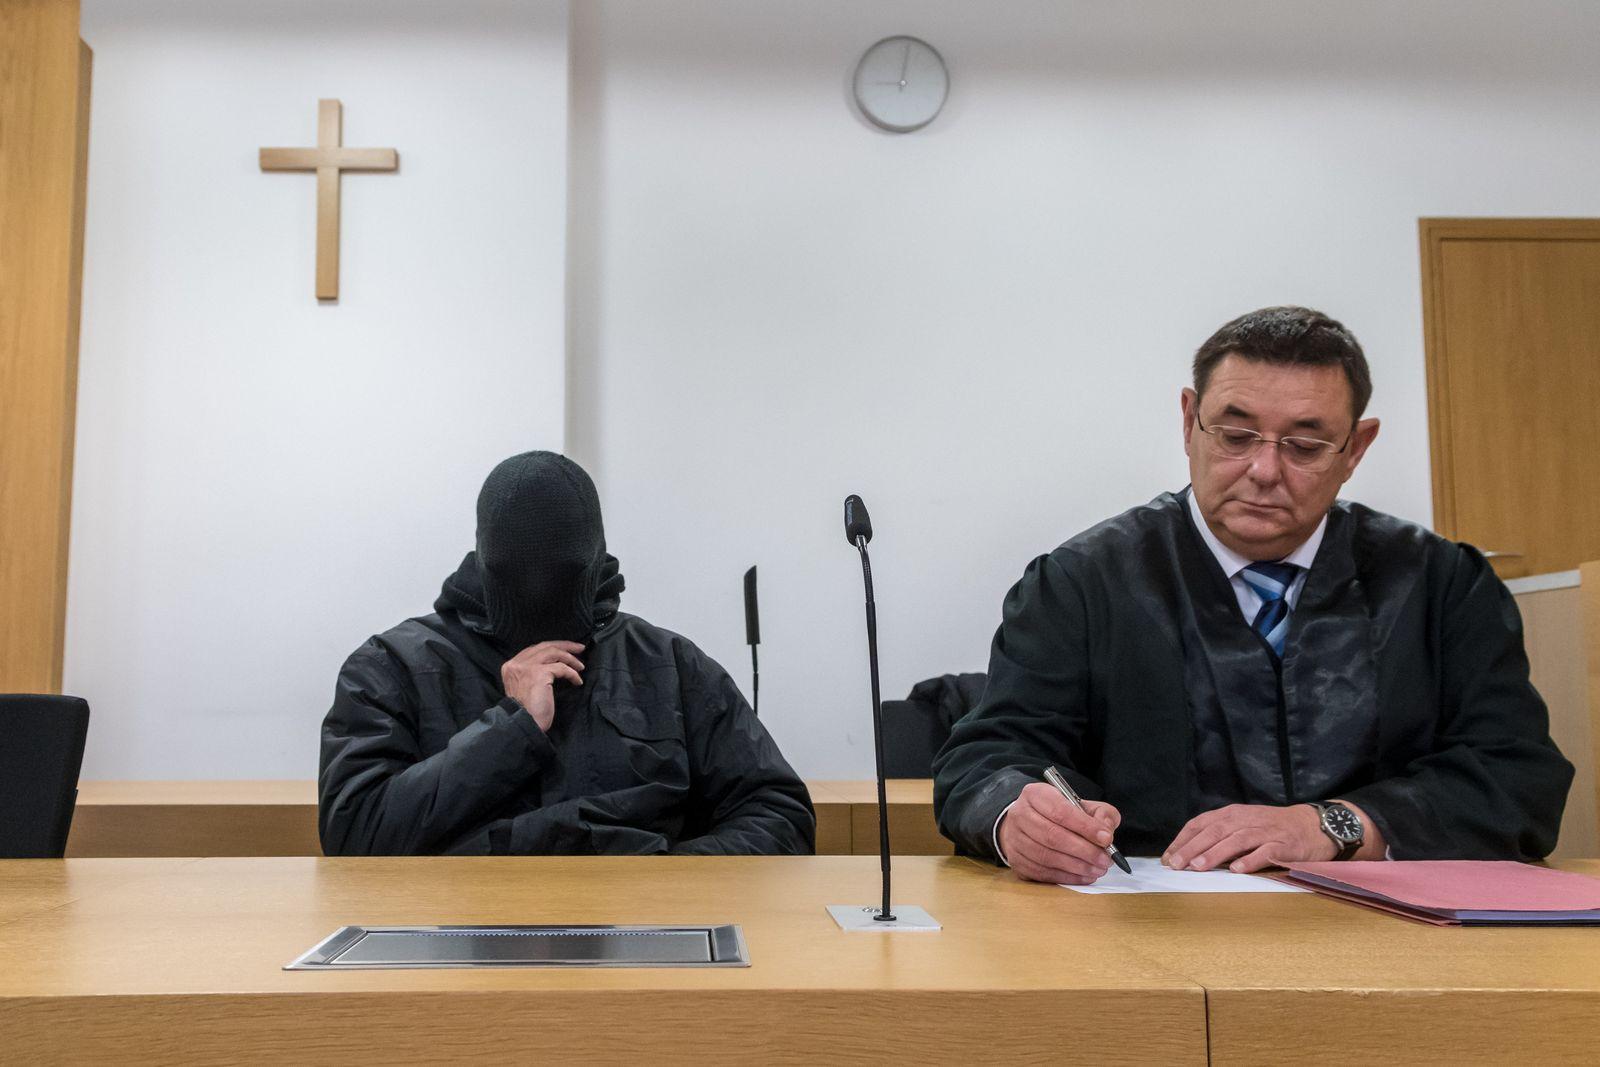 Früherer Priester wegen sexuellen Missbrauchs vor Gericht